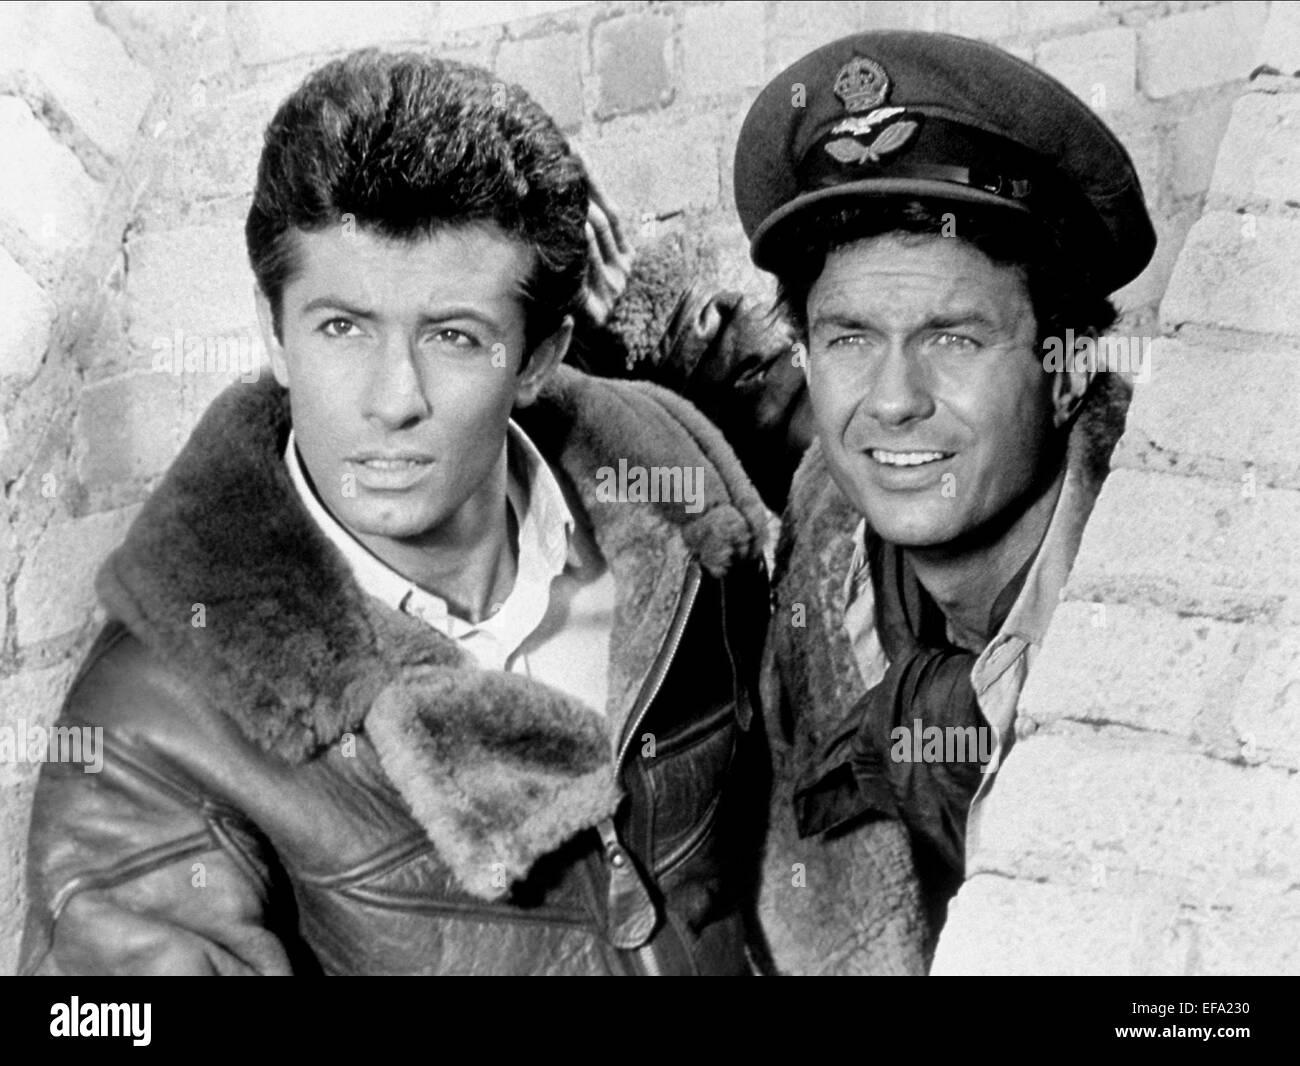 GEORGE CHAKIRIS & CLIFF ROBERTSON 633 SQUADRON (1964)